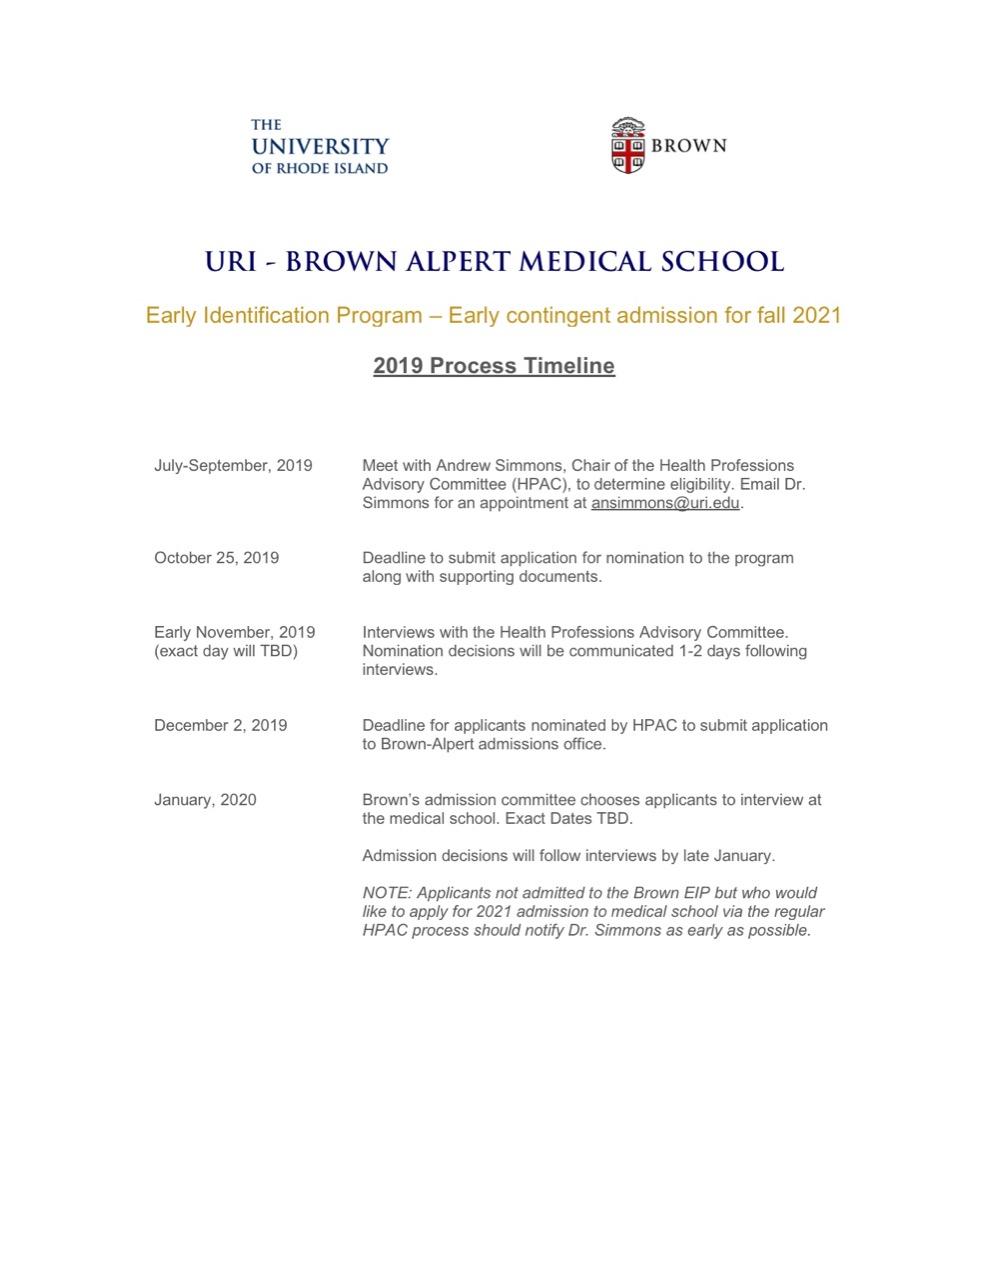 Uri Brown Early Identification Program Within Uri Acadmic Year 2021 – 2020 Schedule